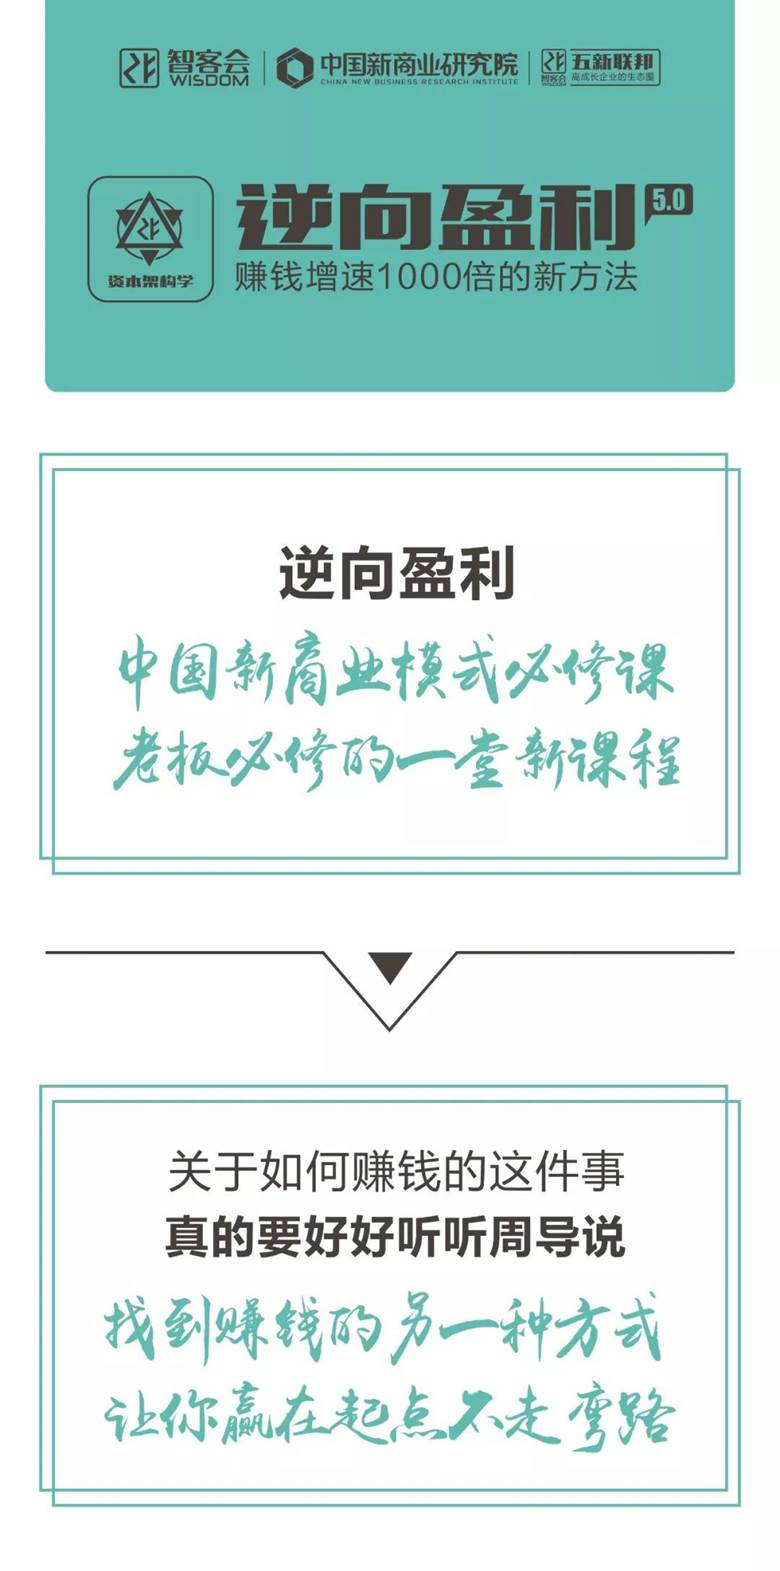 http://www.huodongxing.com/file/20191113/1063603644976/993660716190470.jpeg